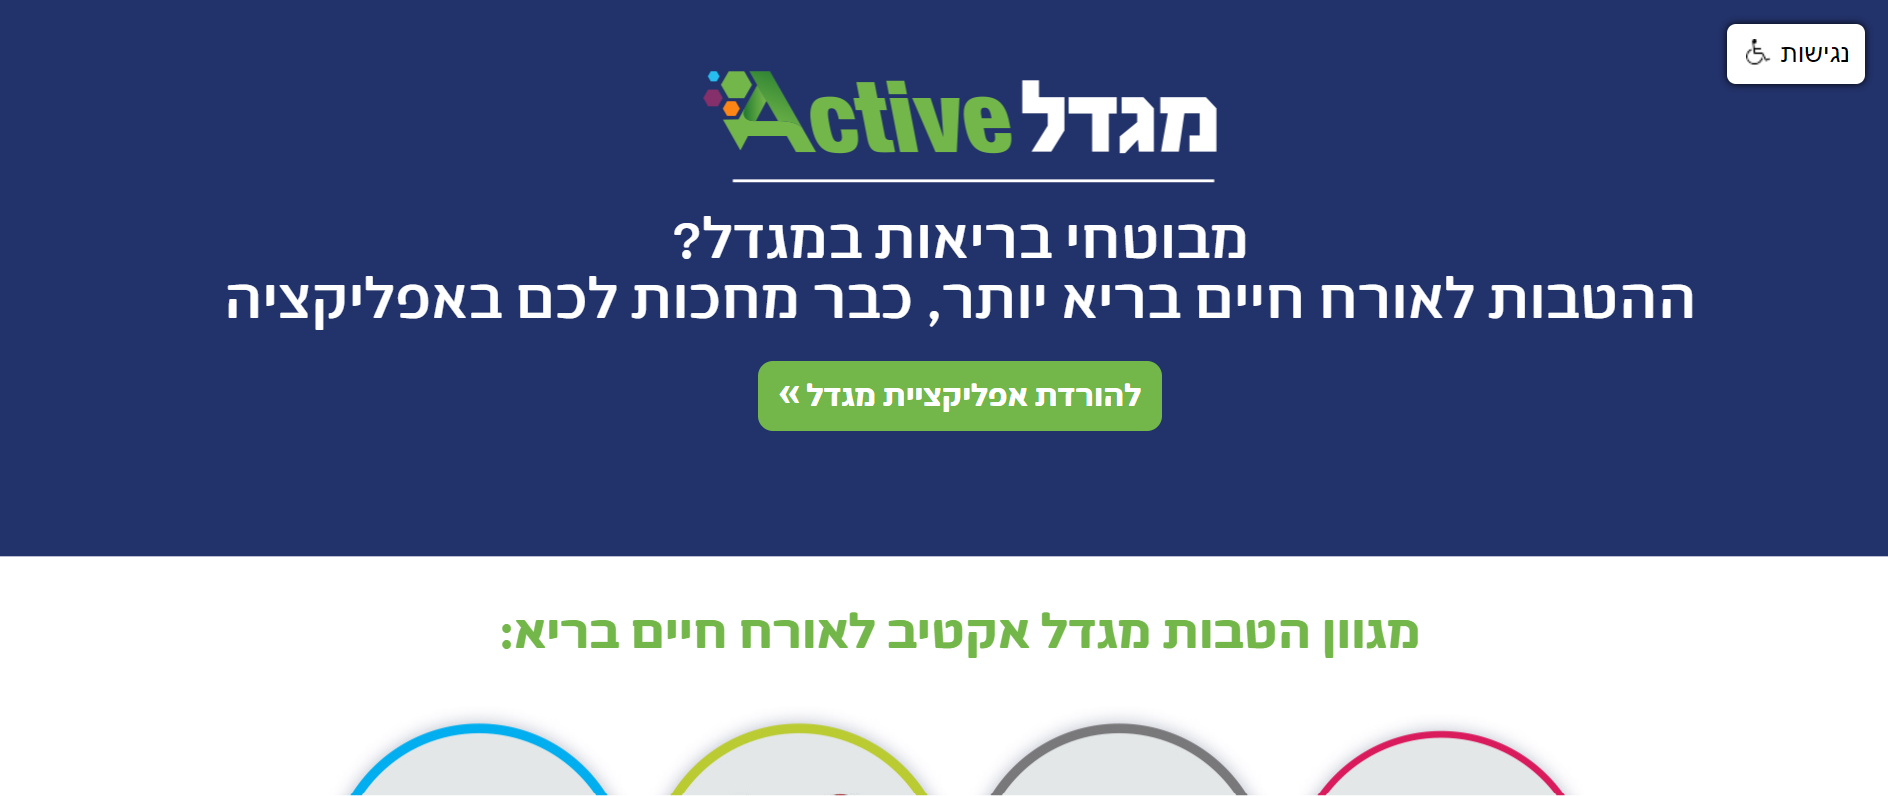 migdal_active